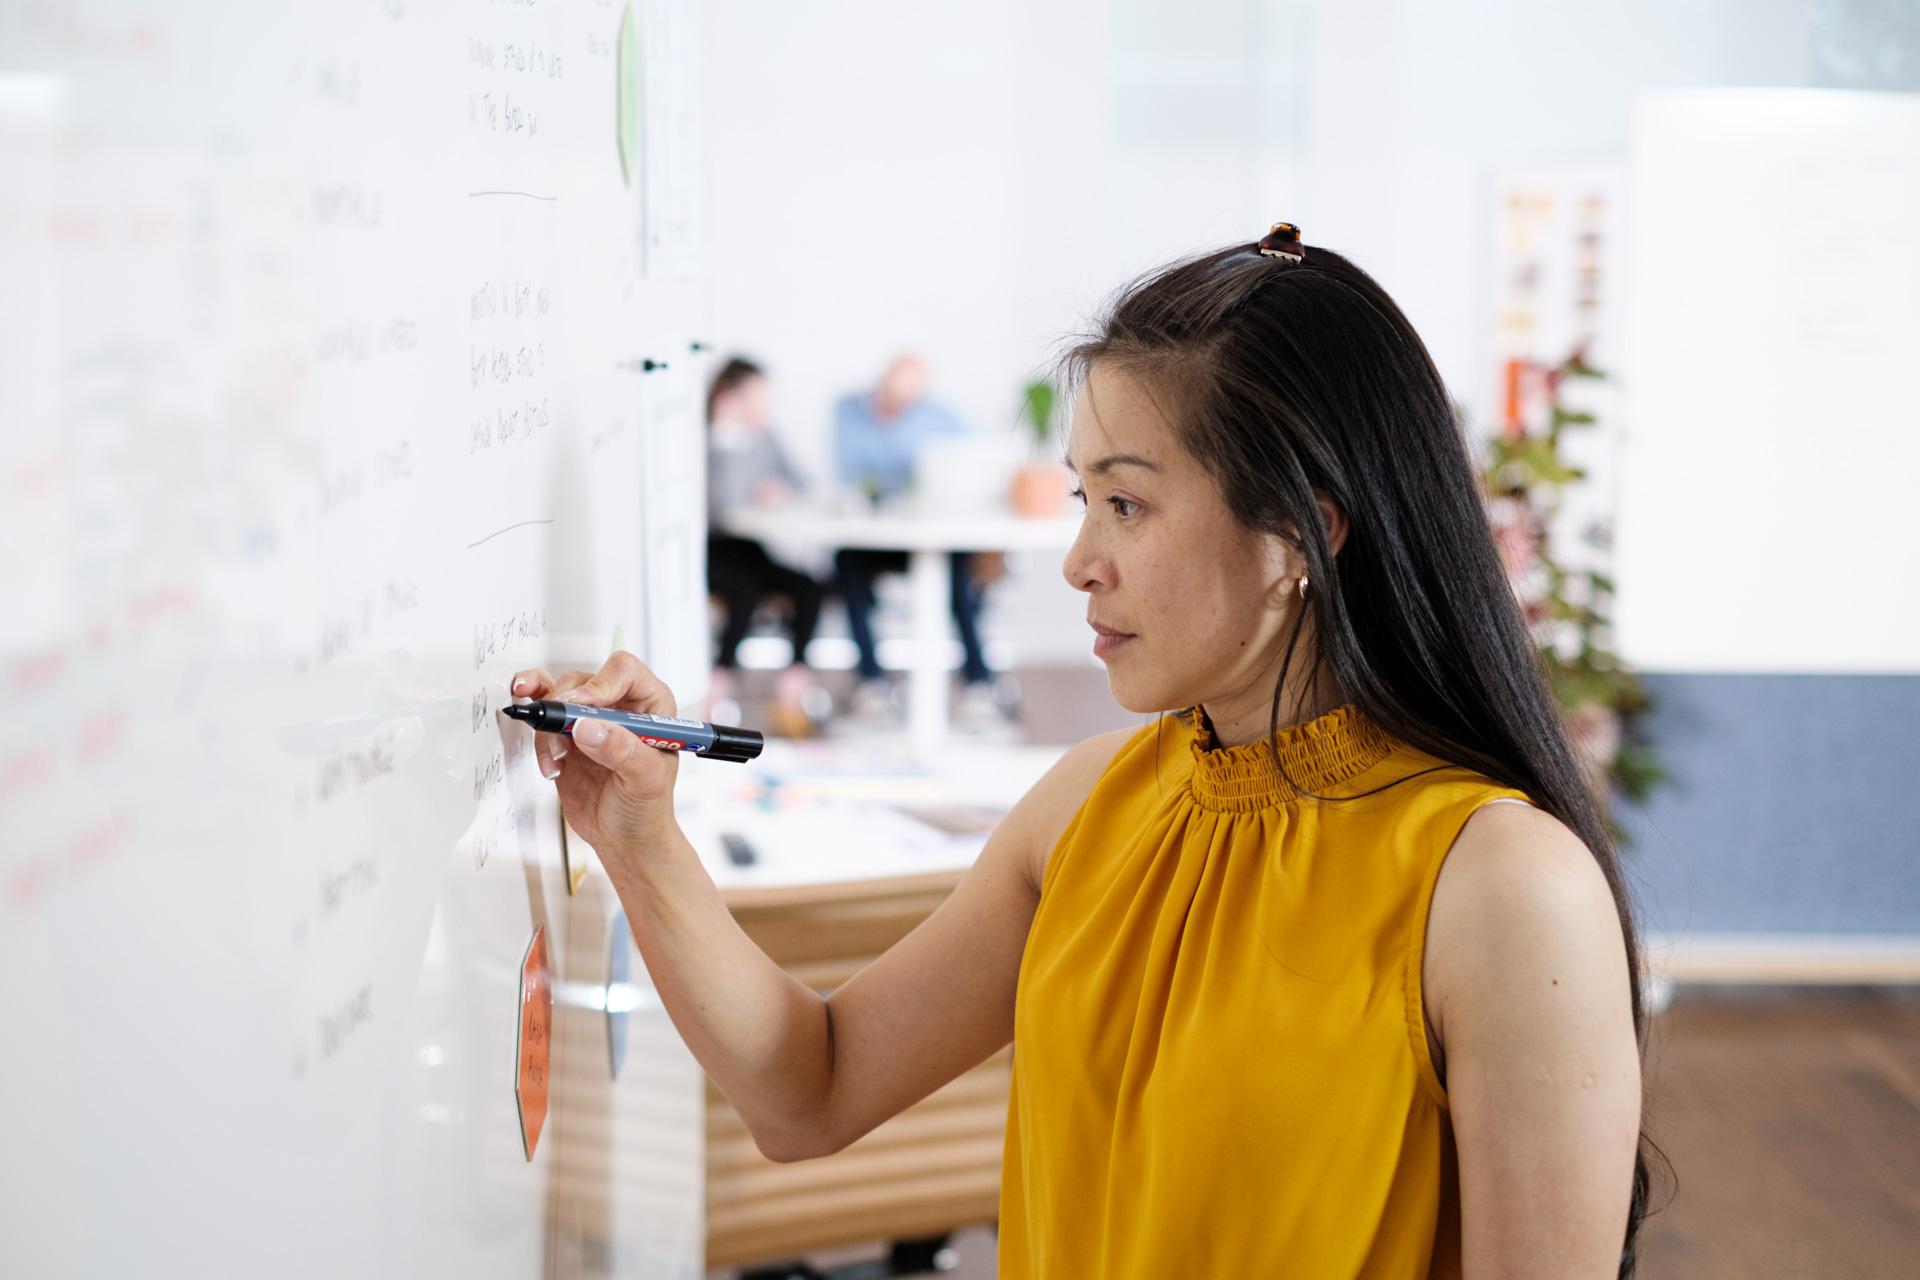 Writing on a ThinkingWall whiteboard